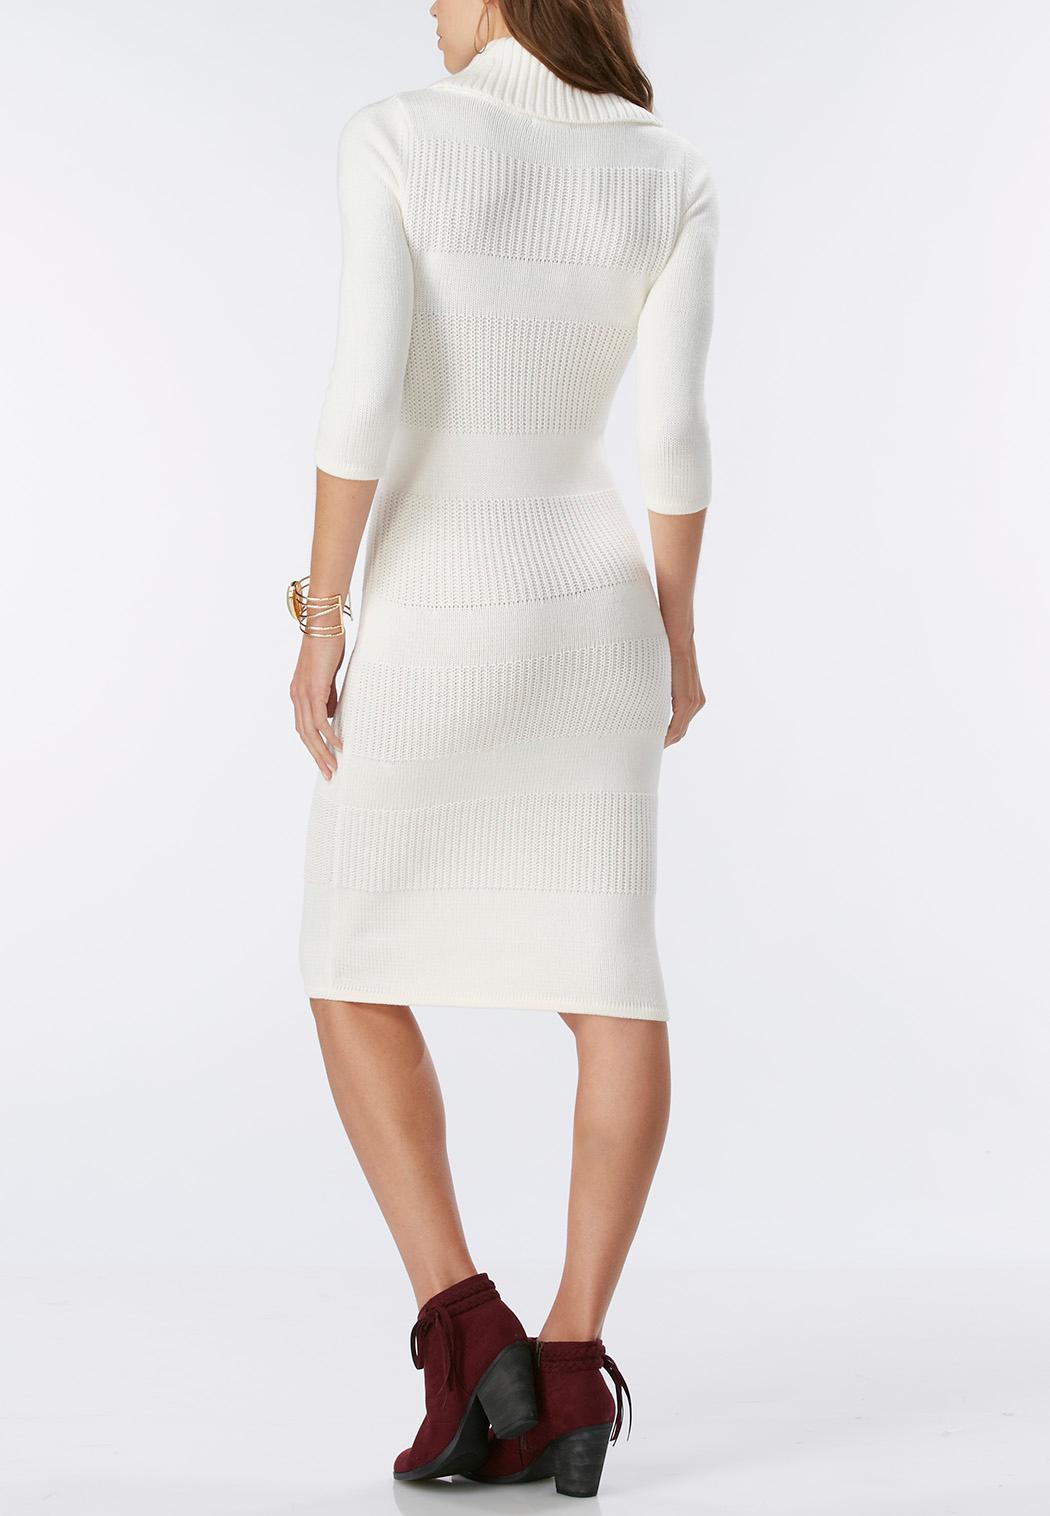 Mixed Knit Cowl Neck Midi Sweater Dress Plus Plus Sizes